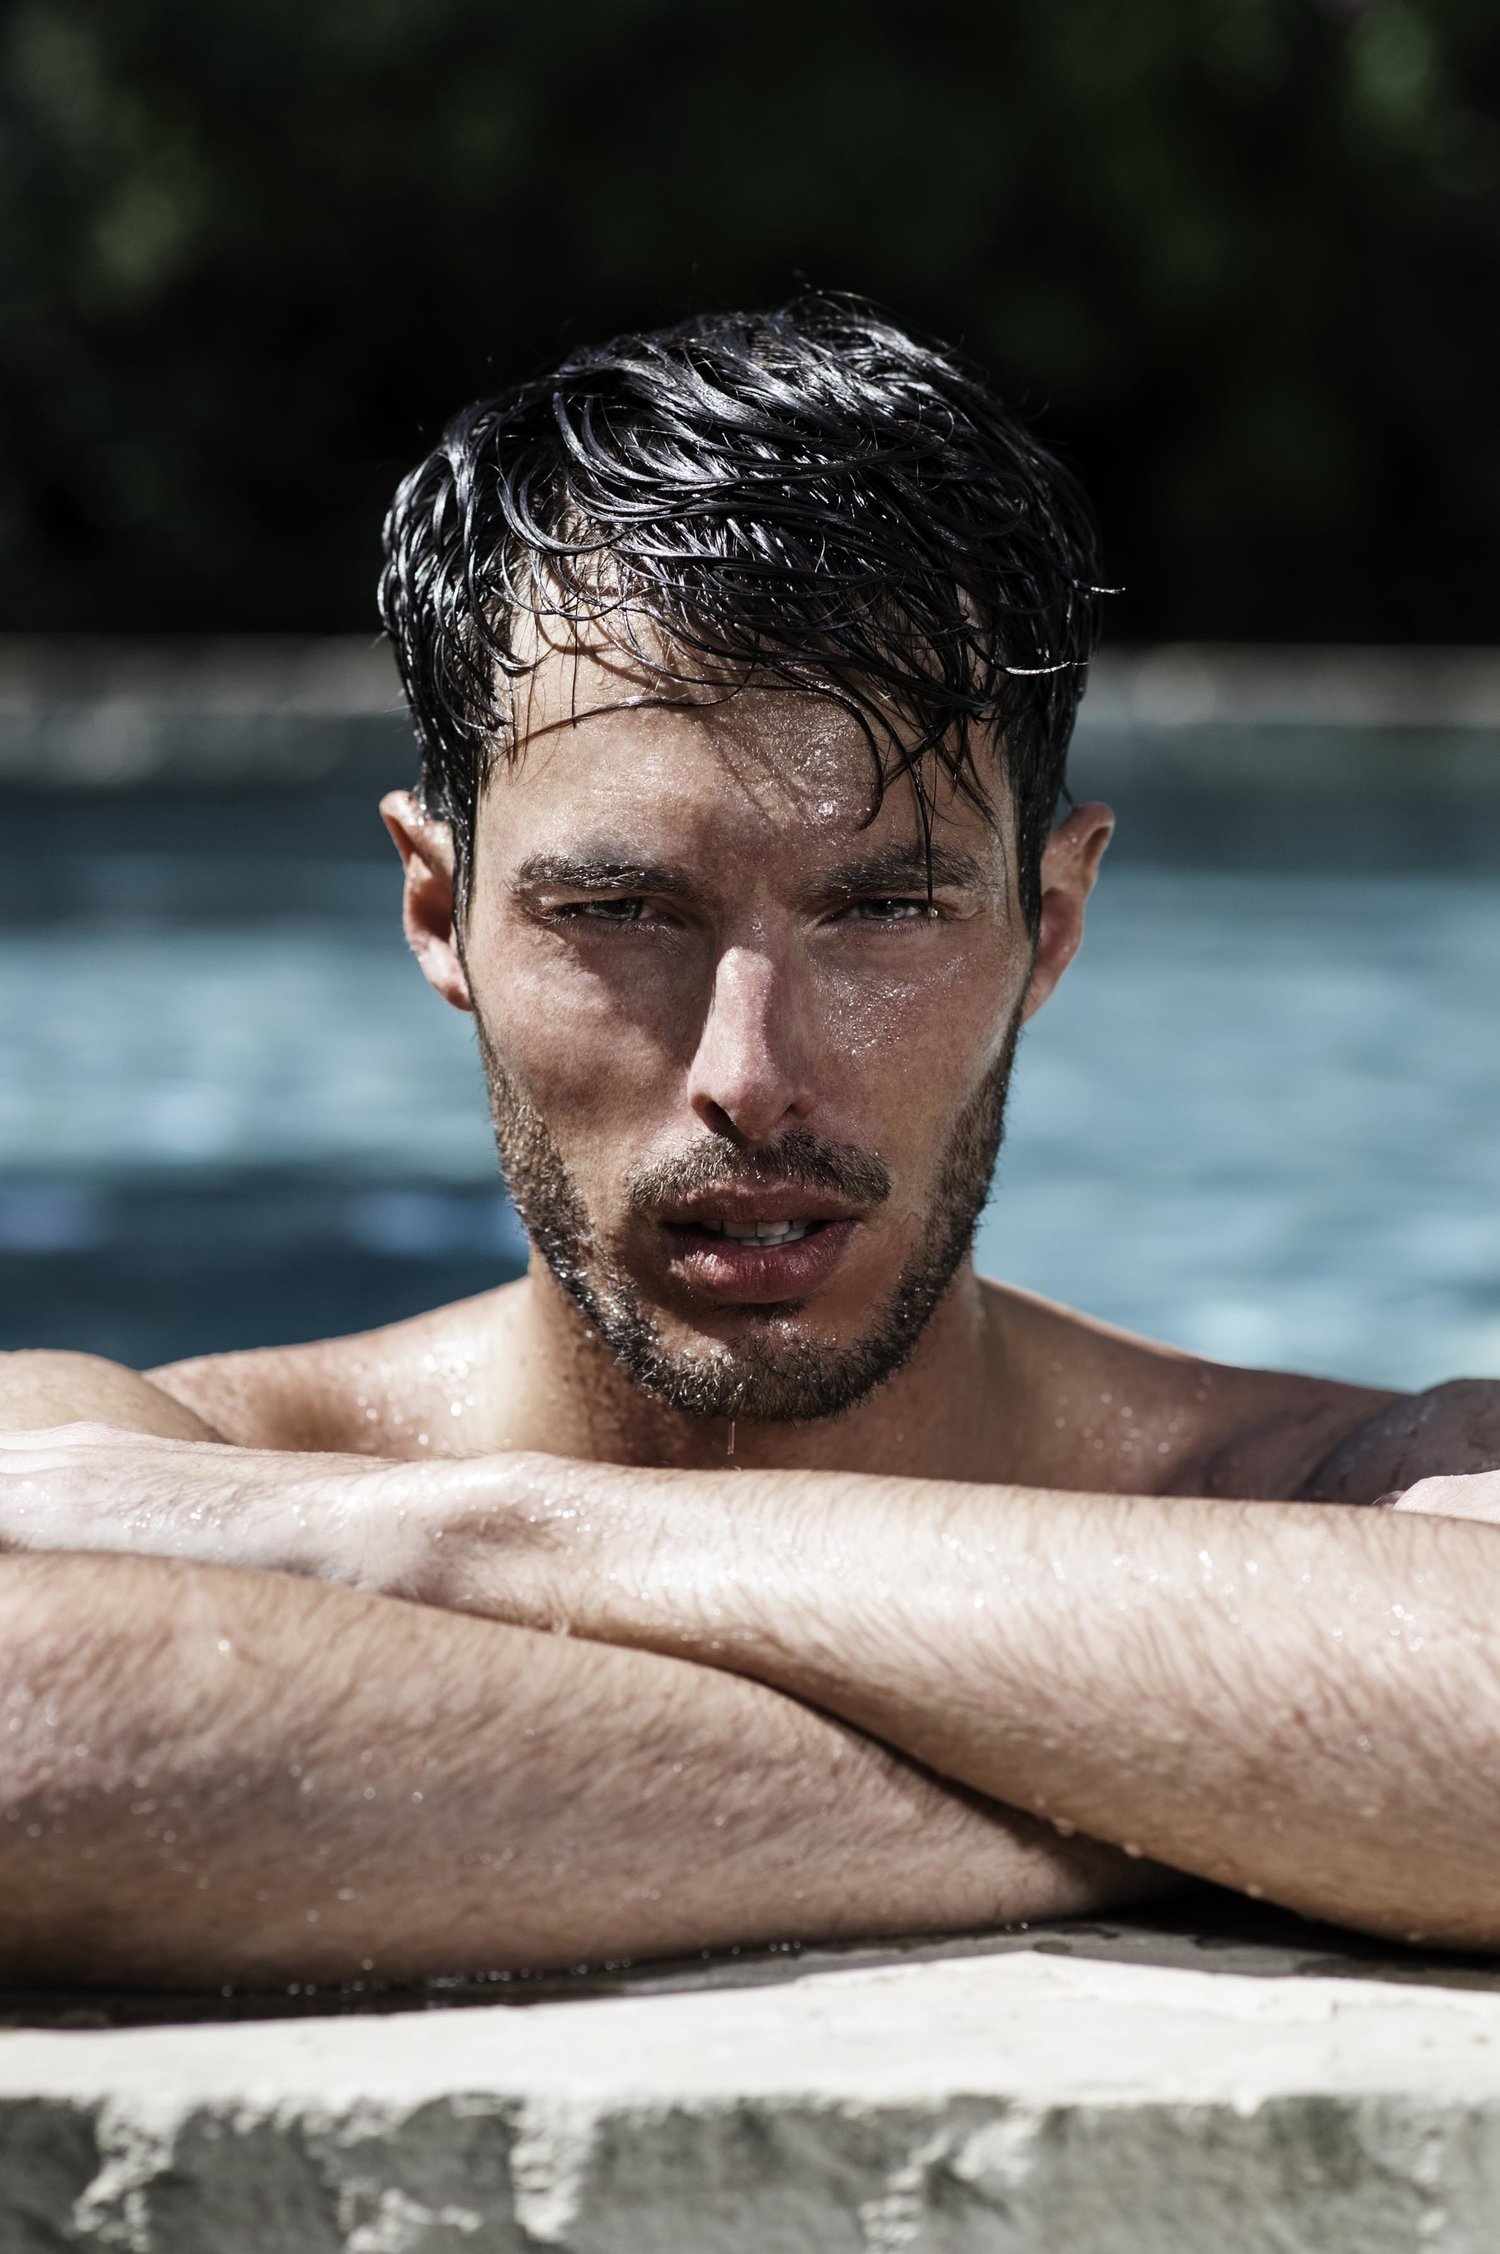 Adon Exclusive: Model Benjamin Isman By Gabriel Quartino